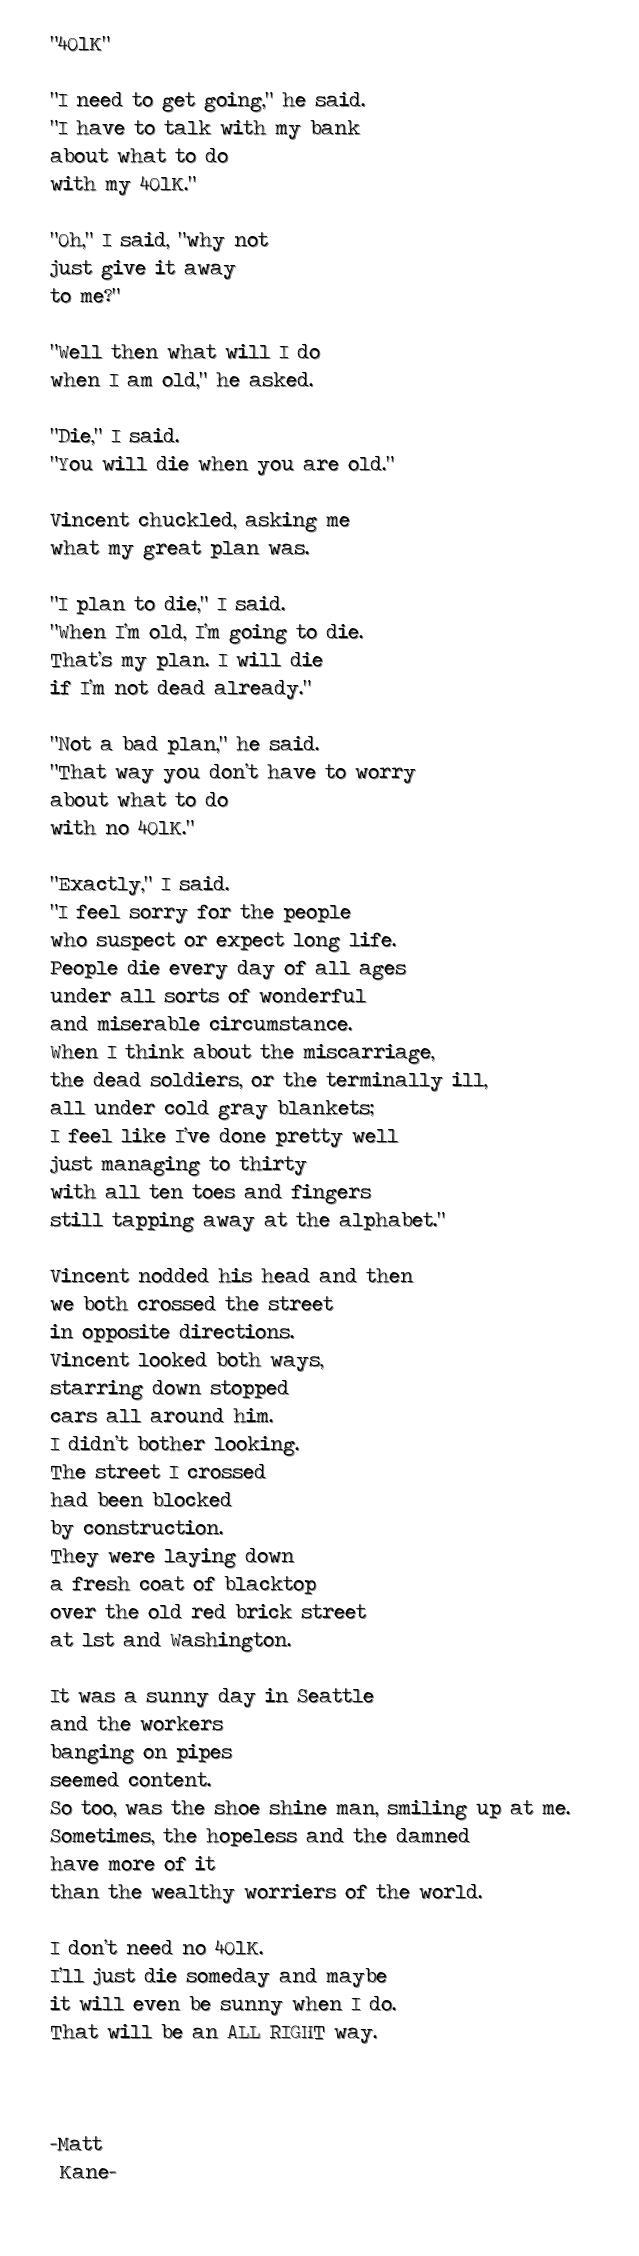 401K - a poem by Matt Kane